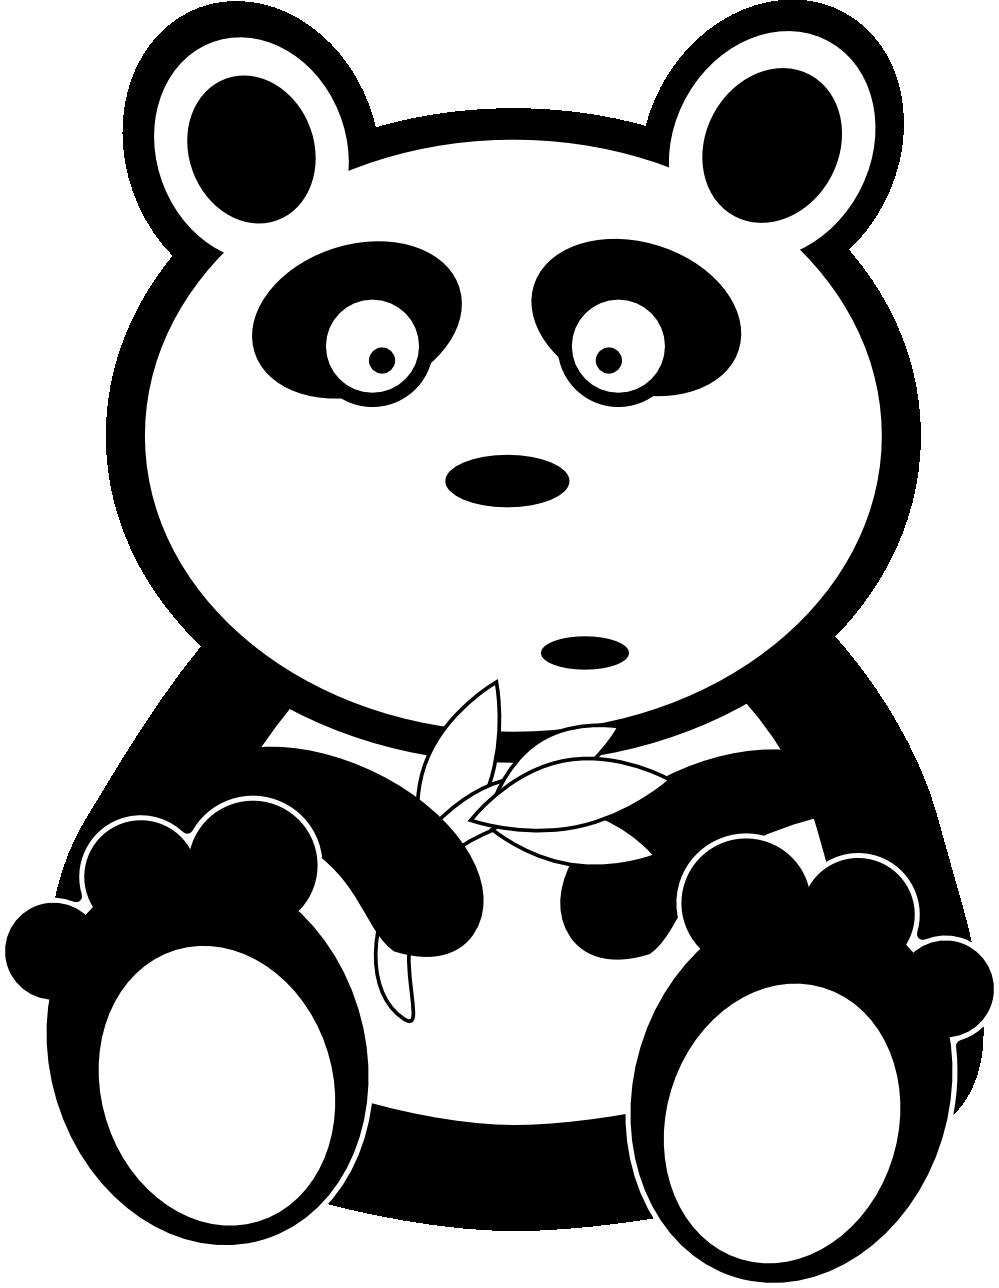 Animal book clipart png black and white clipartist.net » Clip Art » adam lowe panda black white line art ... png black and white